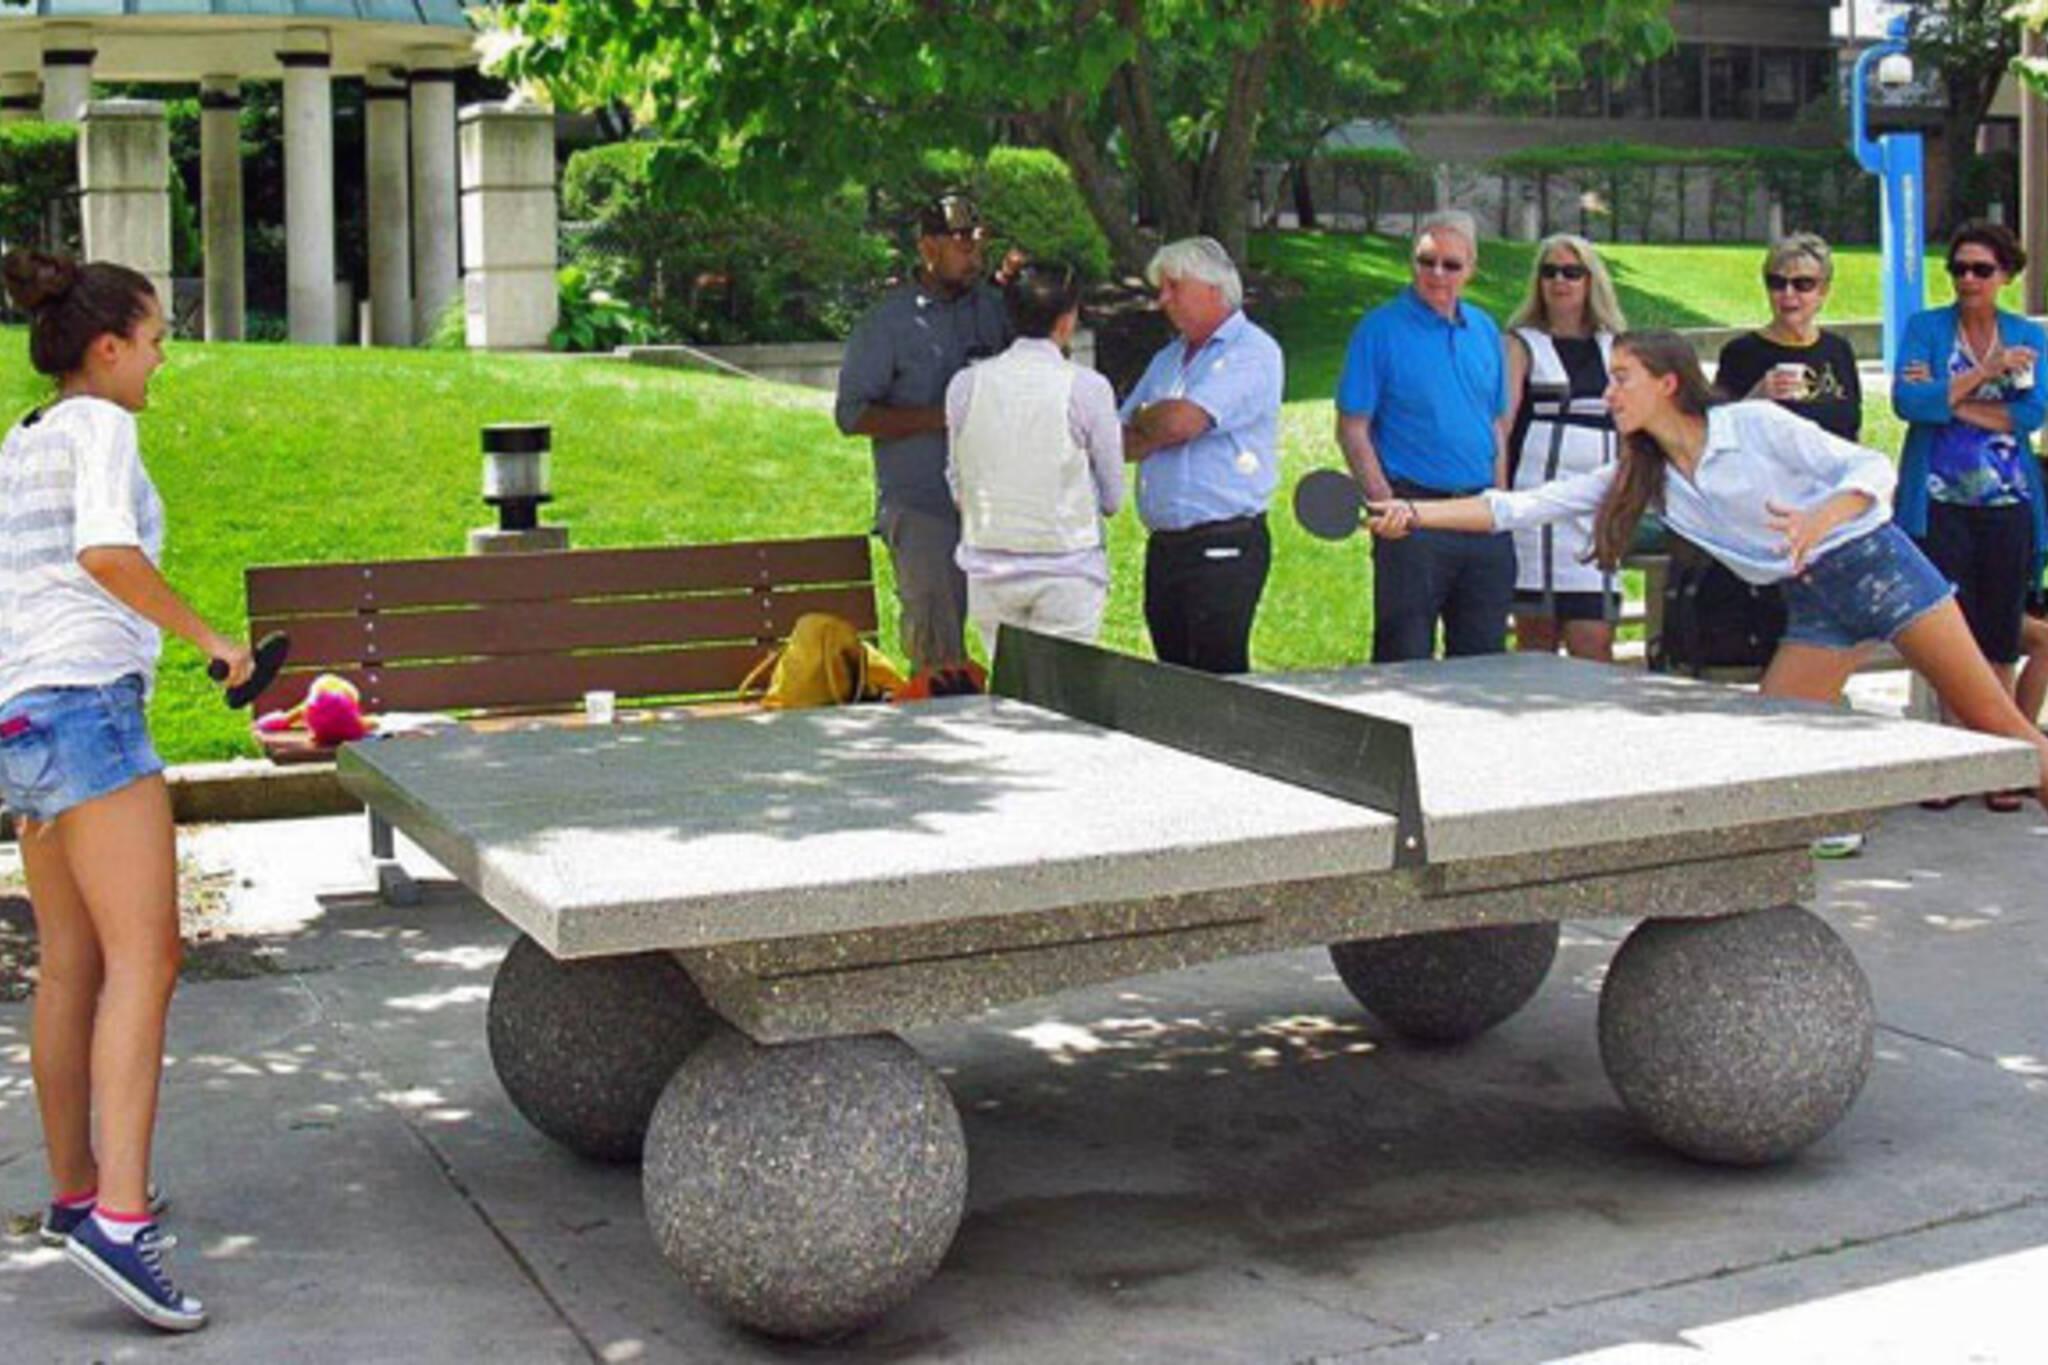 outdoor ping pong toronto